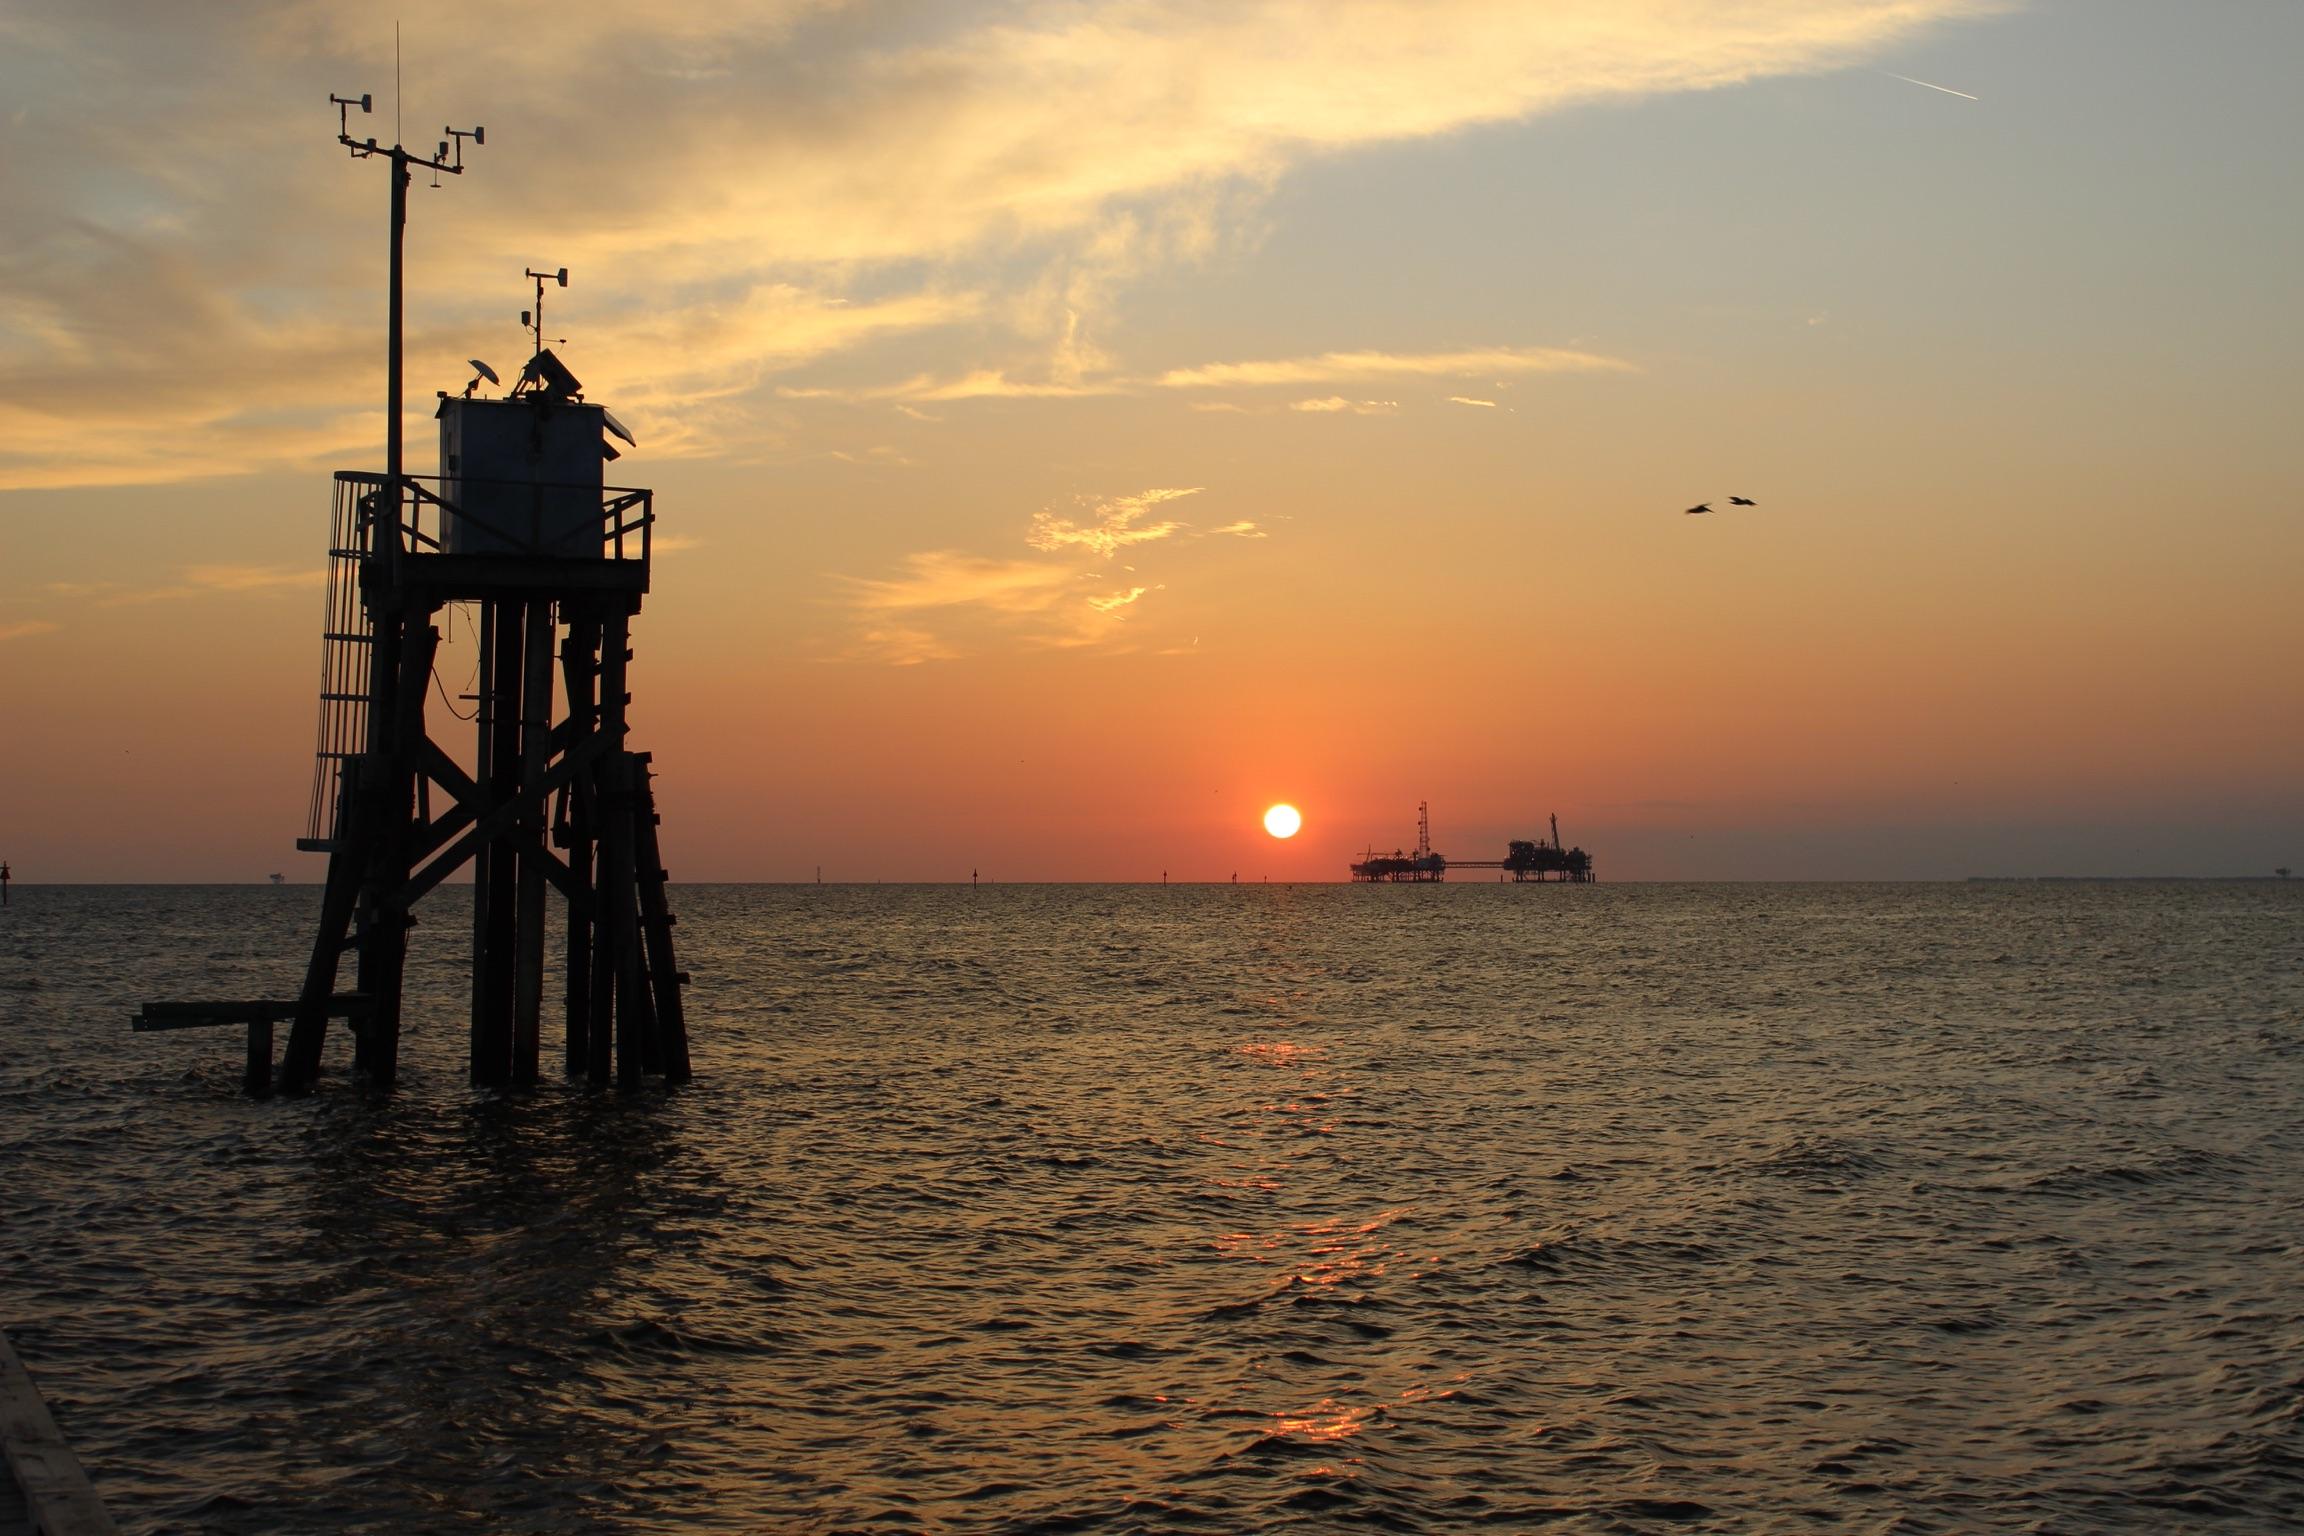 Mobile Bay, Dauphin Island, AL. Photo by Lauren Clance